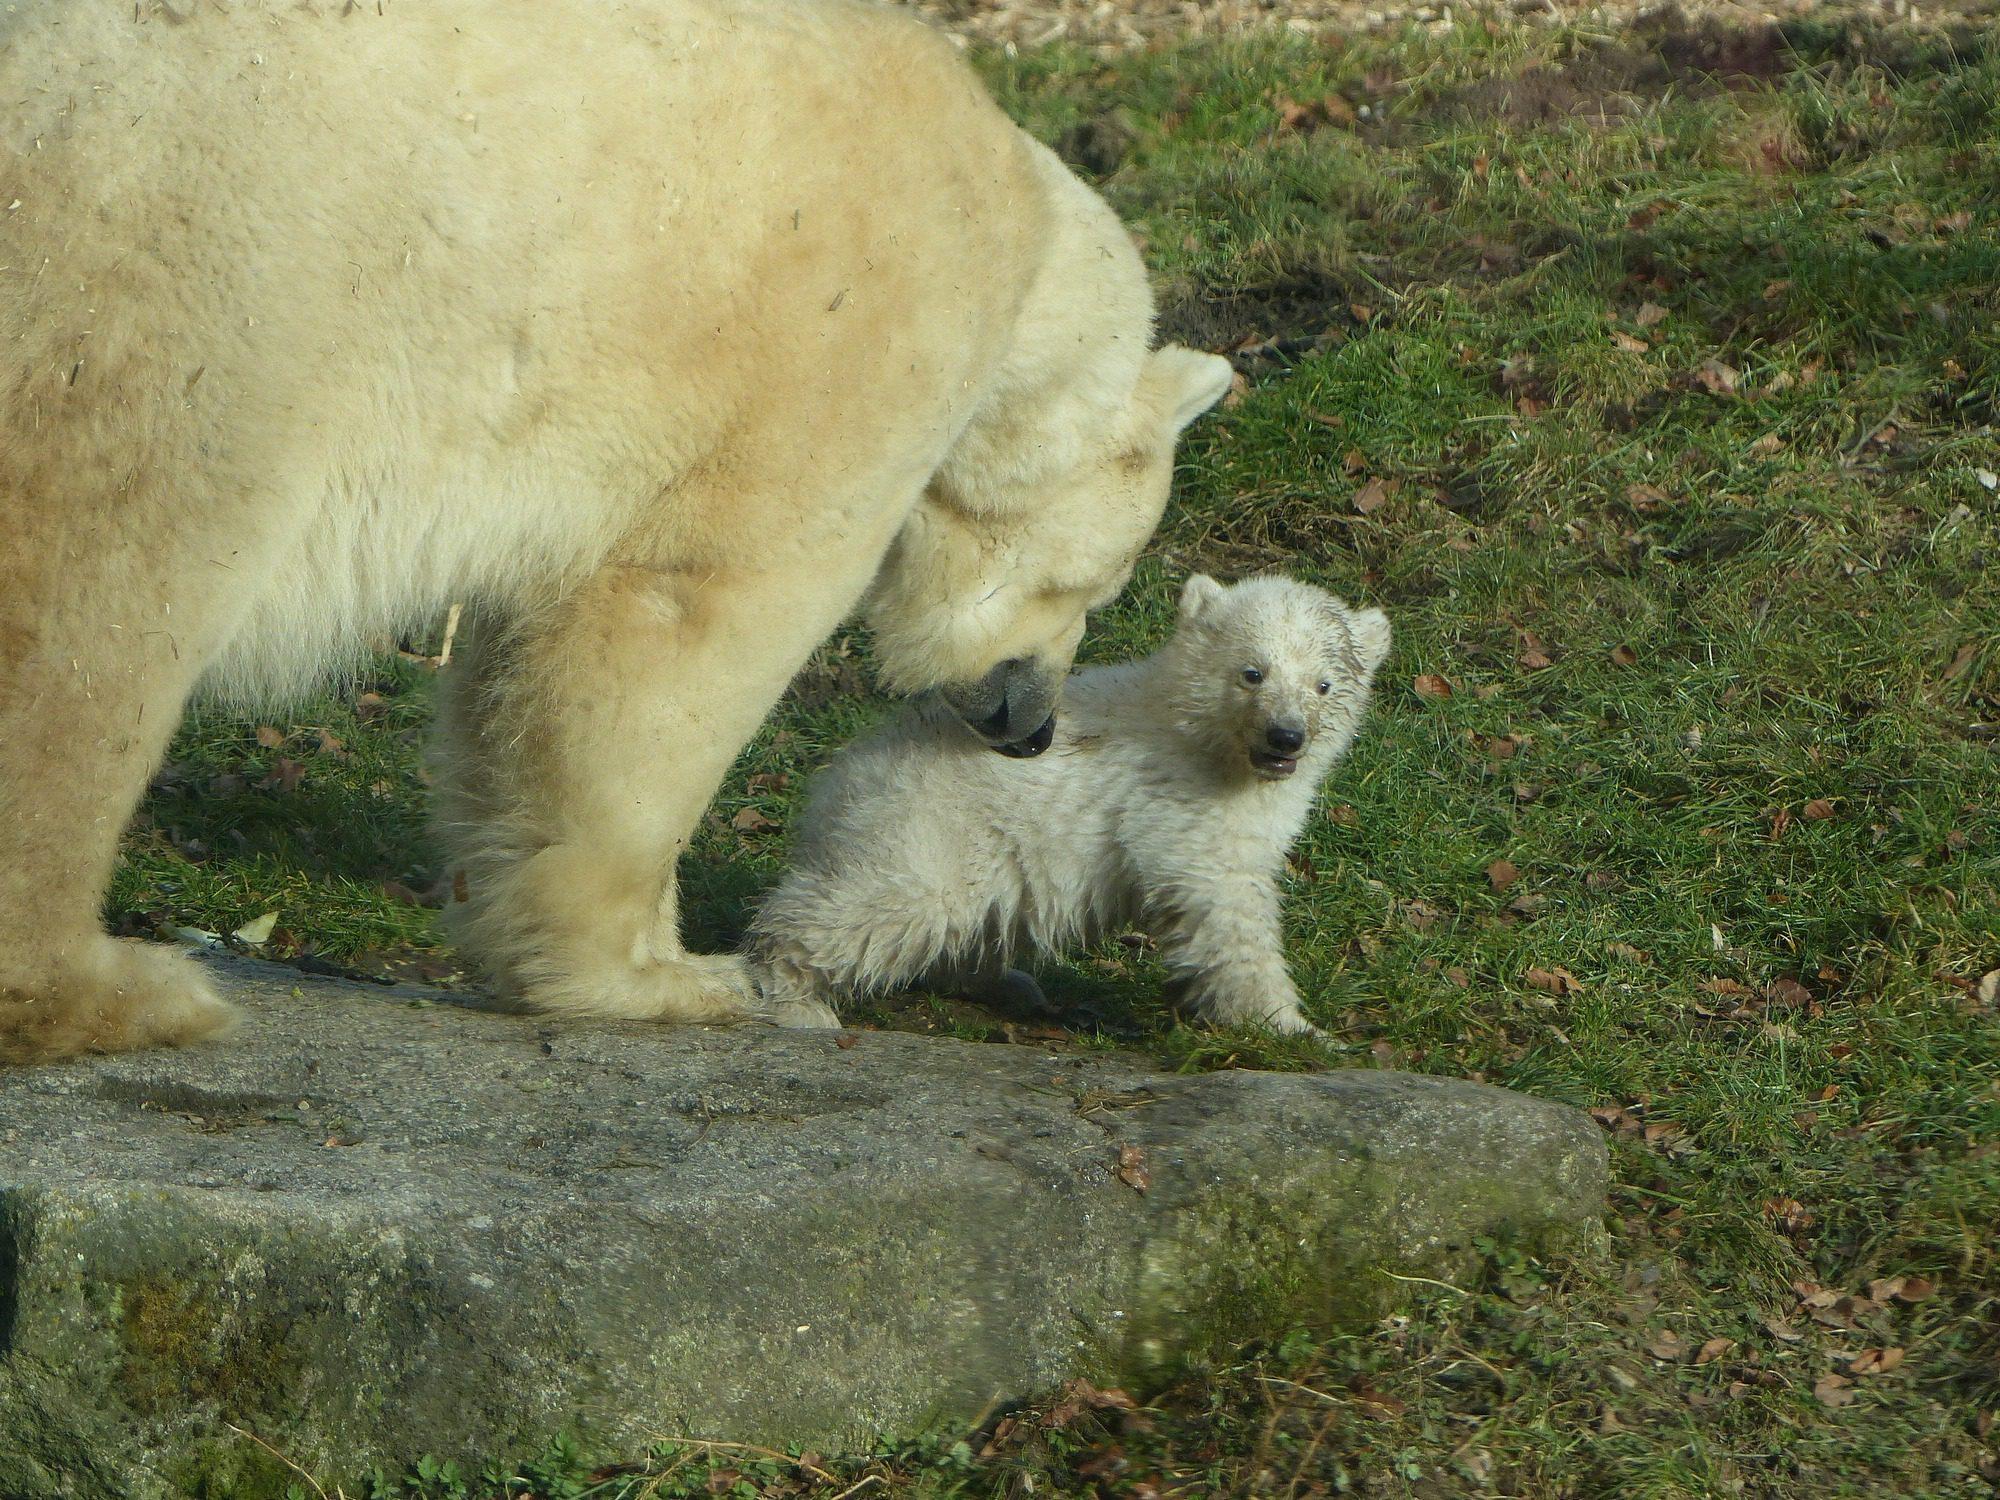 Eisbärin Giovanna und Tochter Quintana im Tierpark Hellabrunn Februar 2017